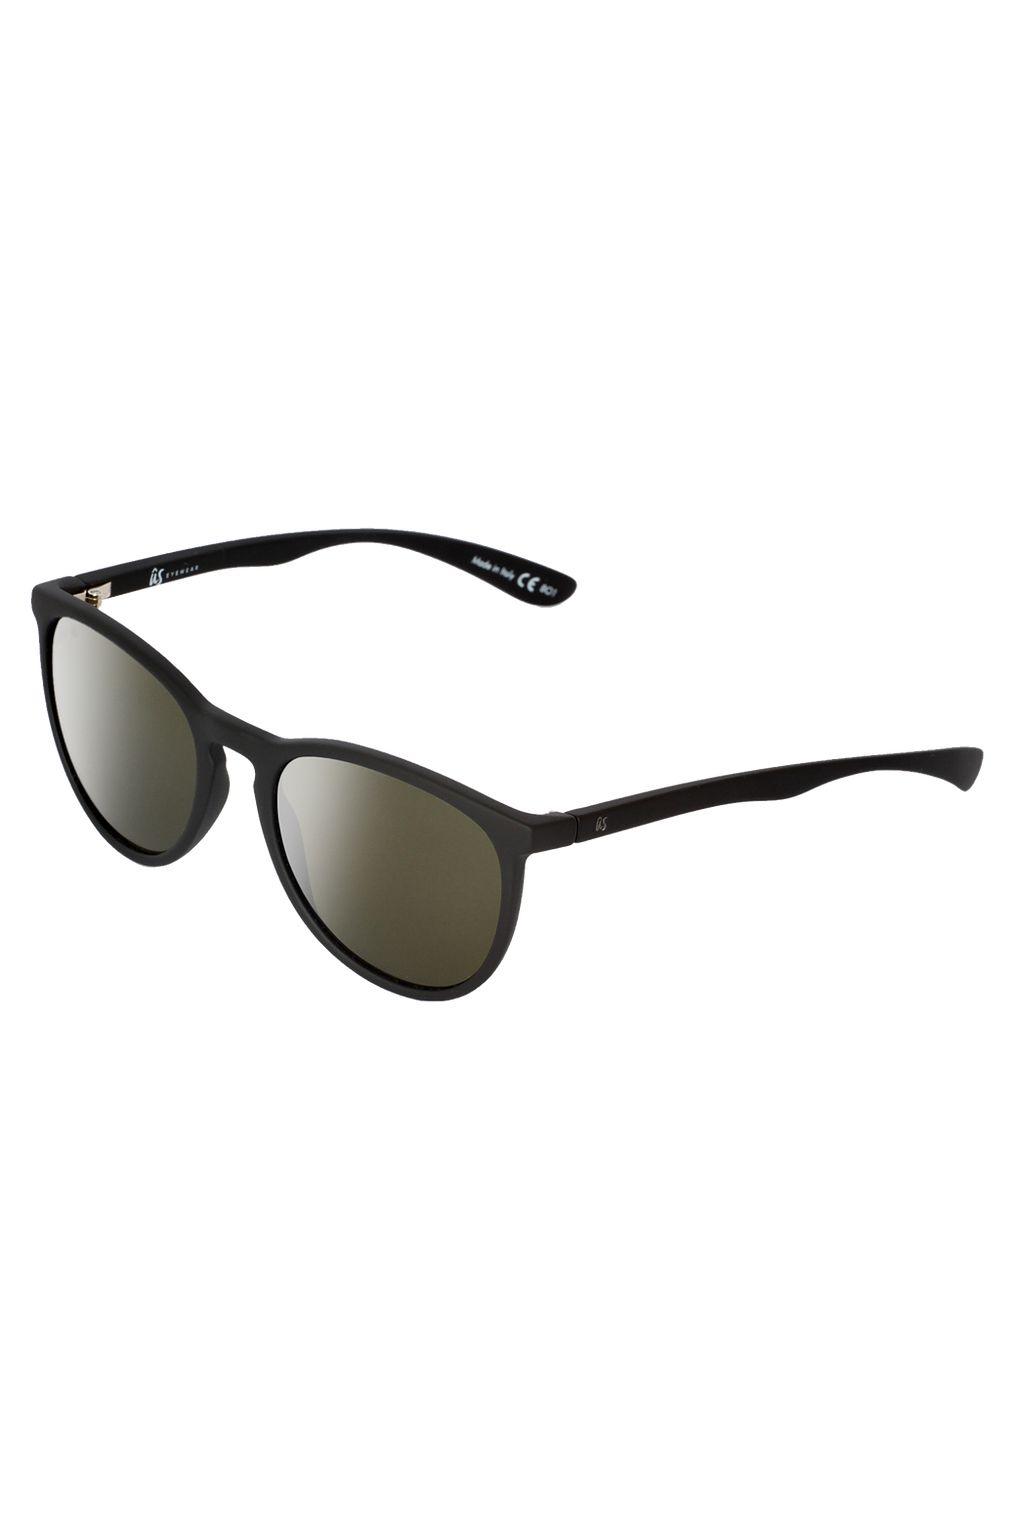 US Sunglasses NOBIS Matte Black/Vintage Grey Polarized